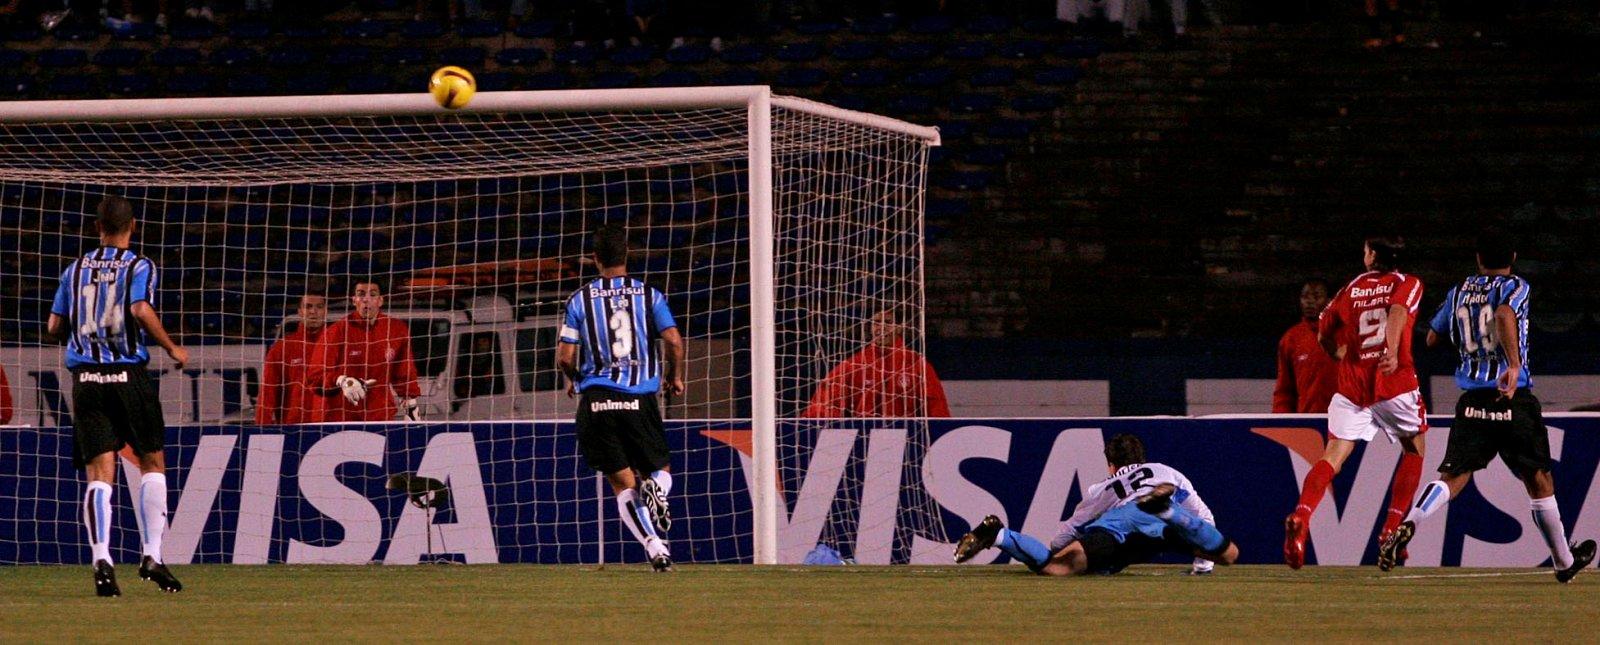 745dca7e8d Inter garante a vaga. E perde a vergonha